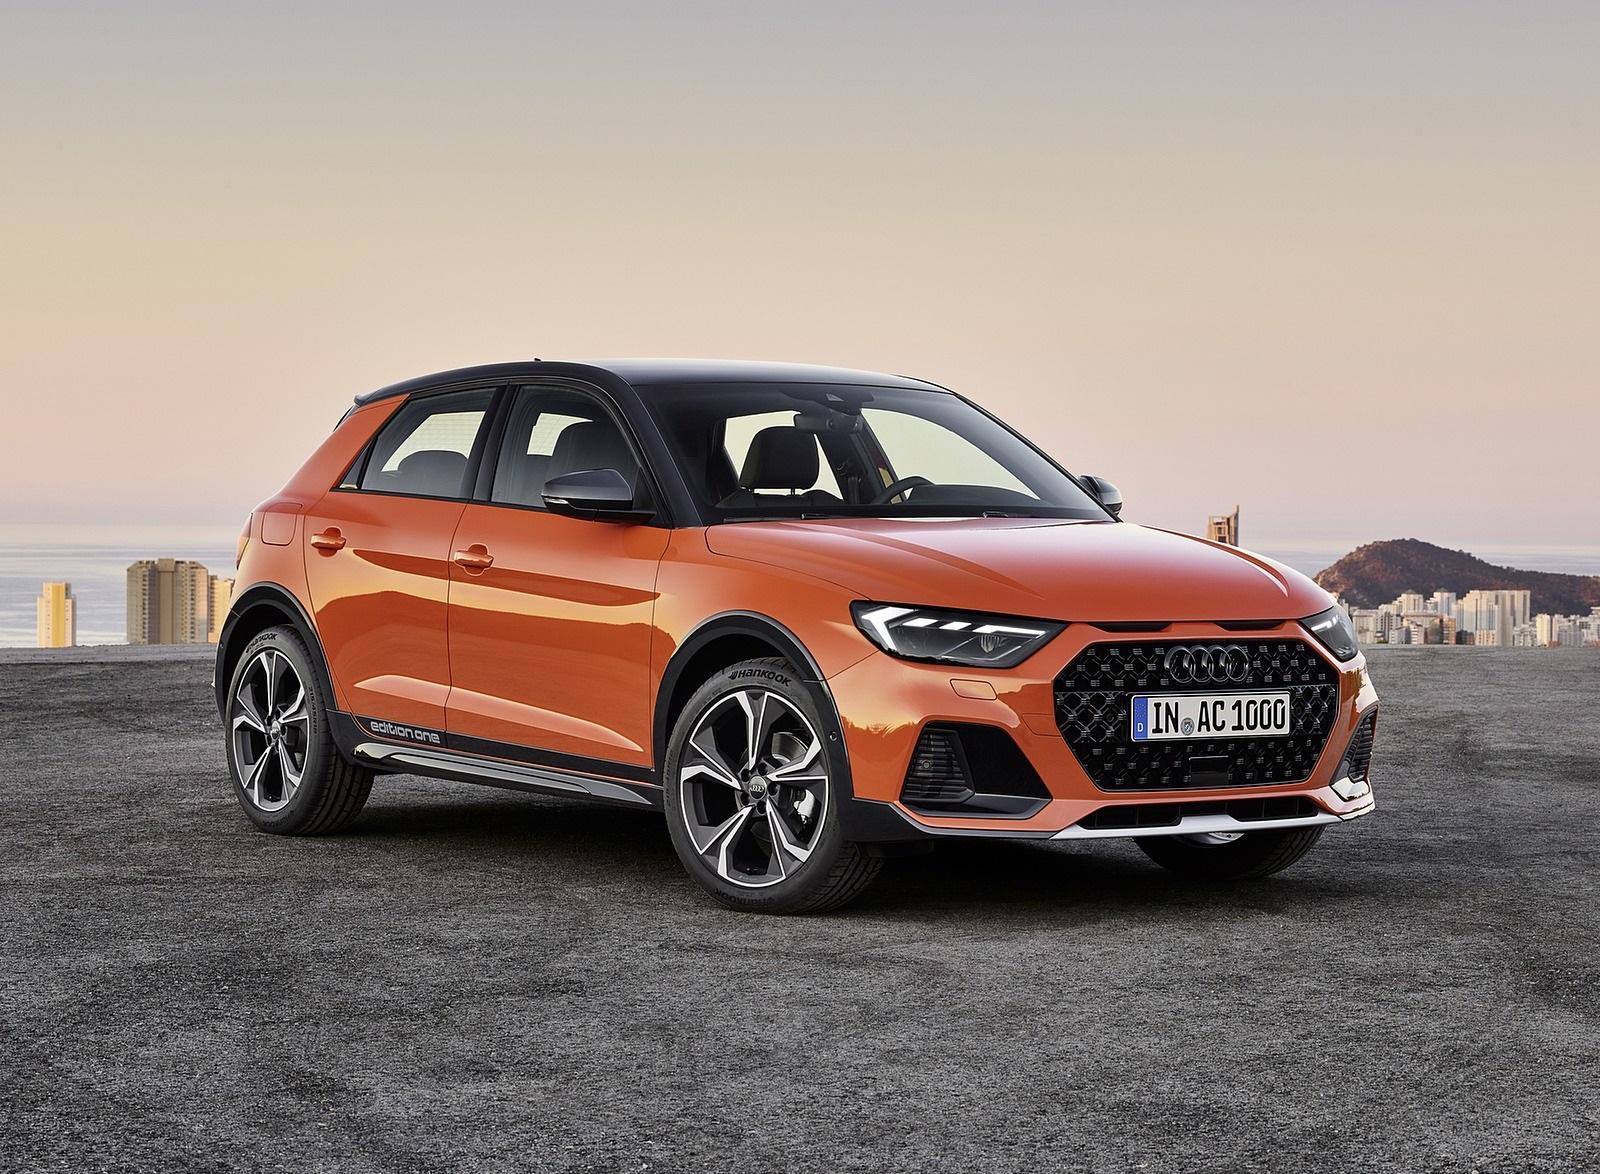 2020 Audi A1 Citycarver (Color: Pulse Orange) Front Three-Quarter Wallpapers (9)